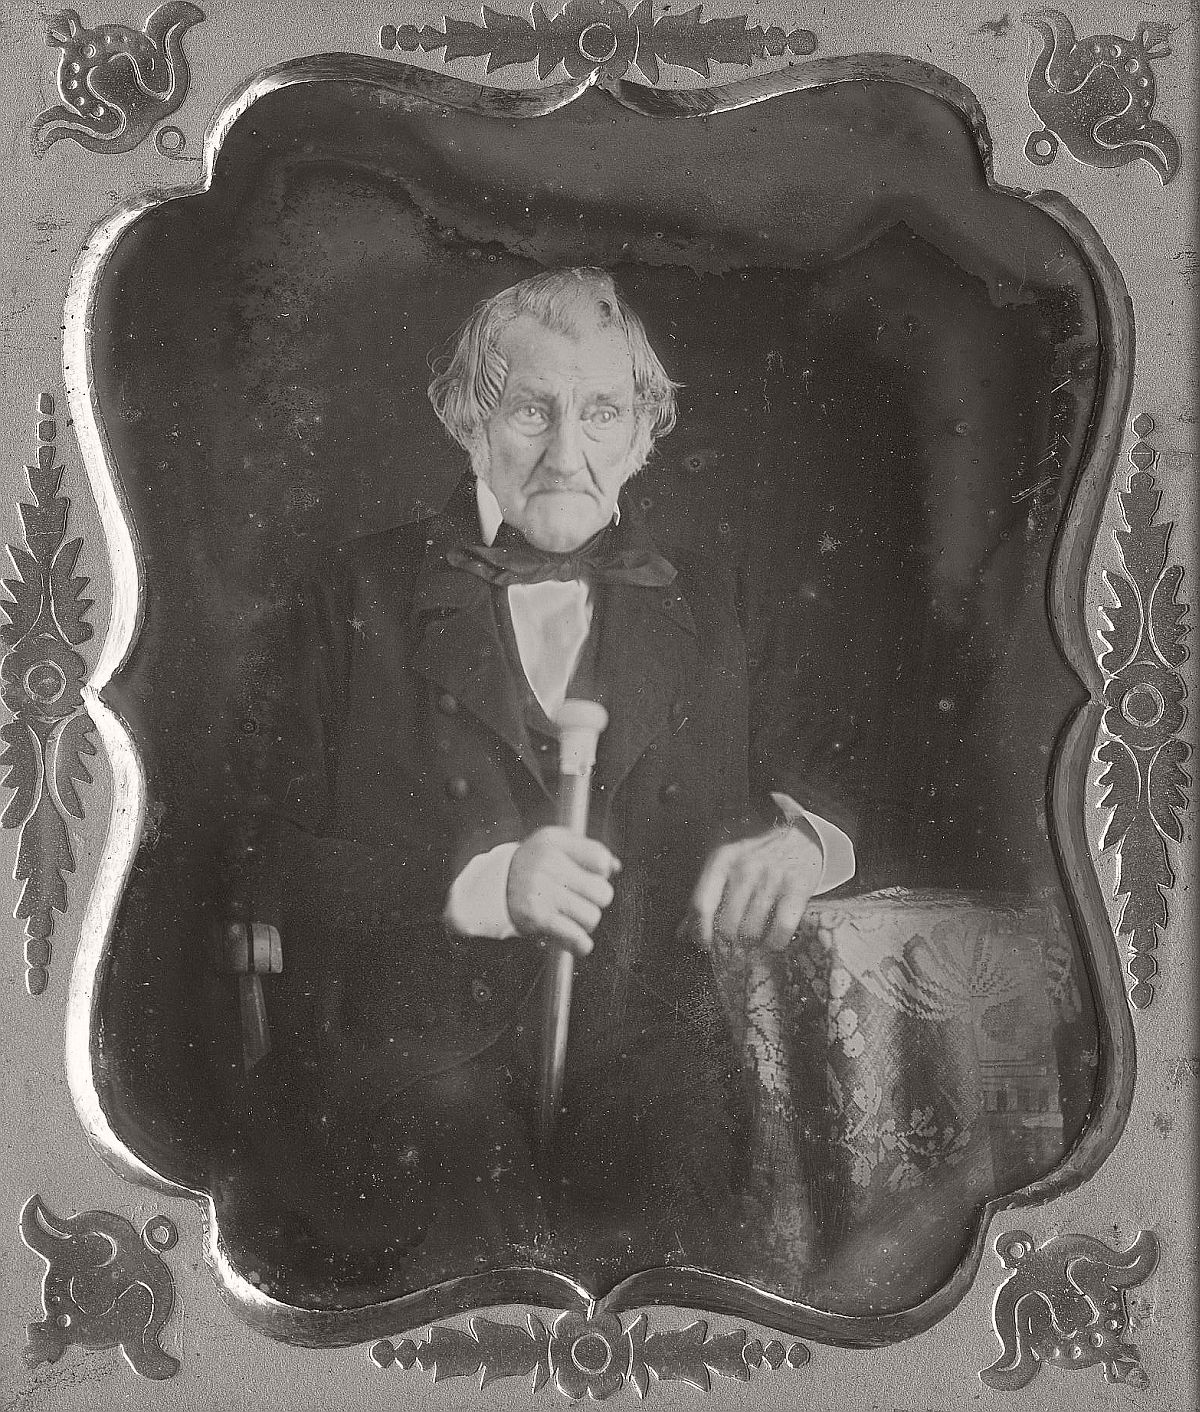 daguerreotype-portrait-people-born-in-the-late-18th-xviii-century-1700s-vintage-46